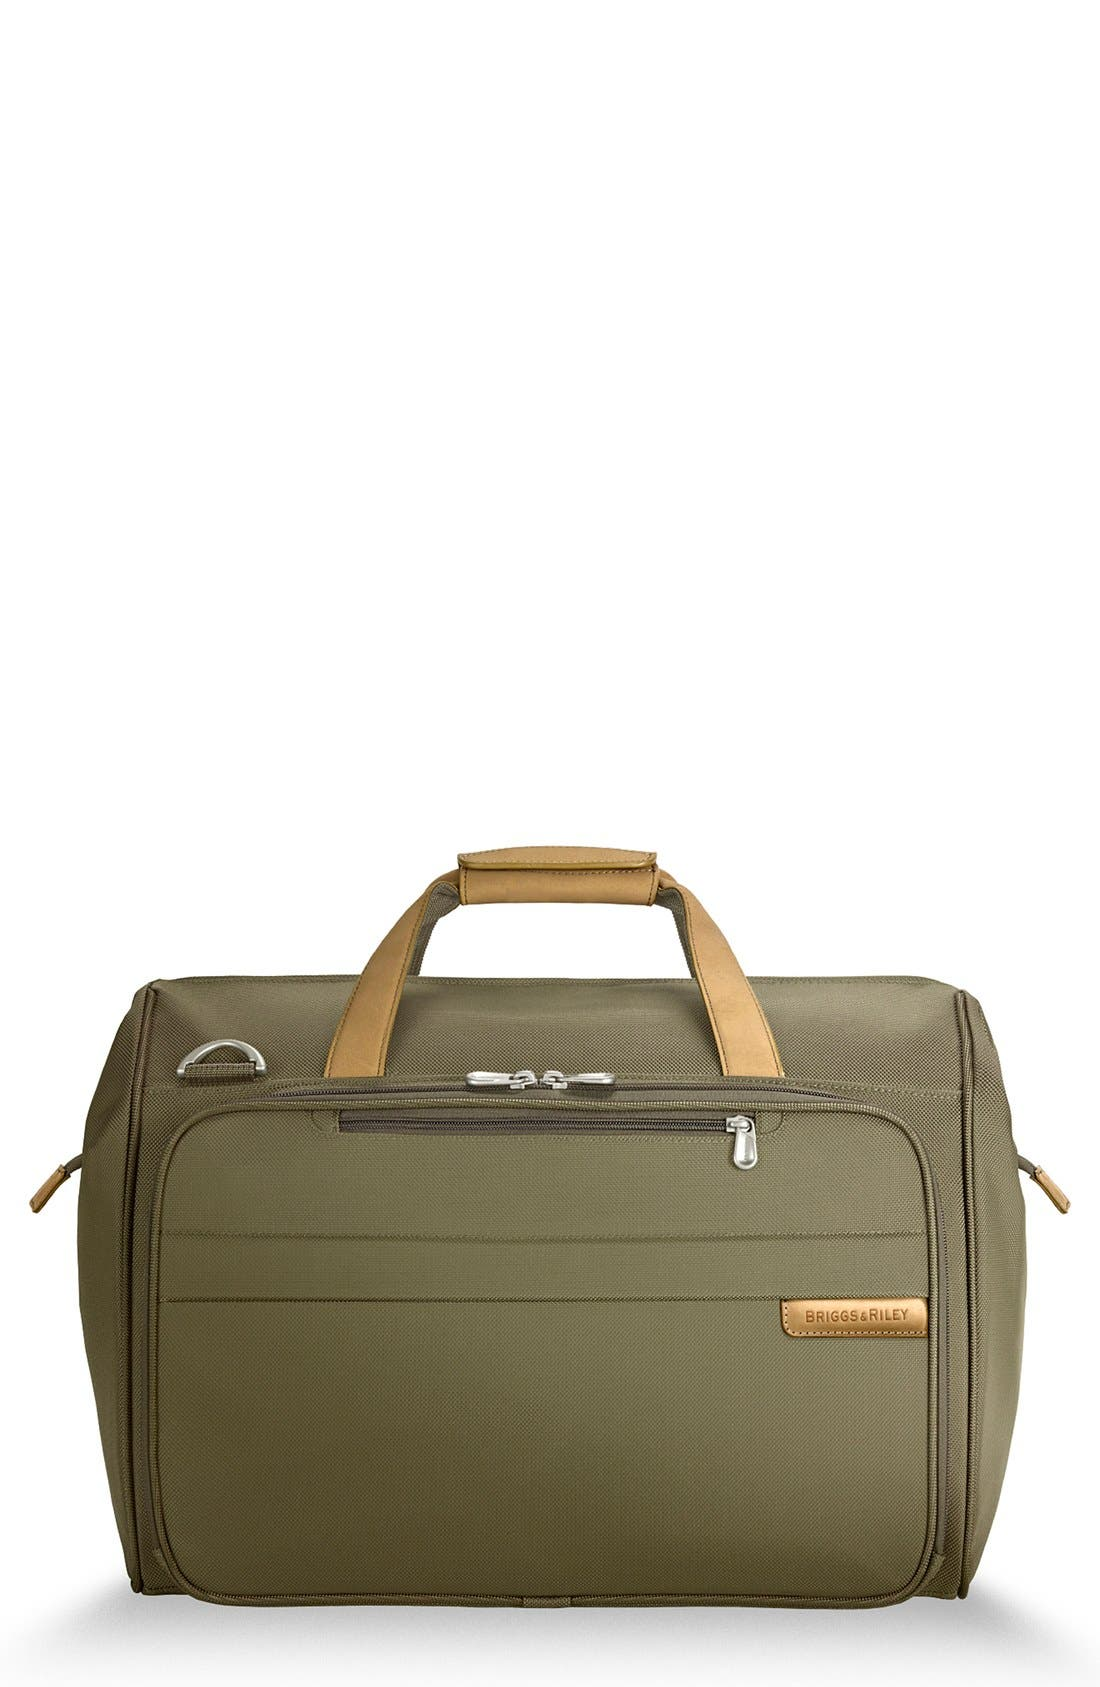 'Baseline' Duffel Bag,                         Main,                         color, Olive Green